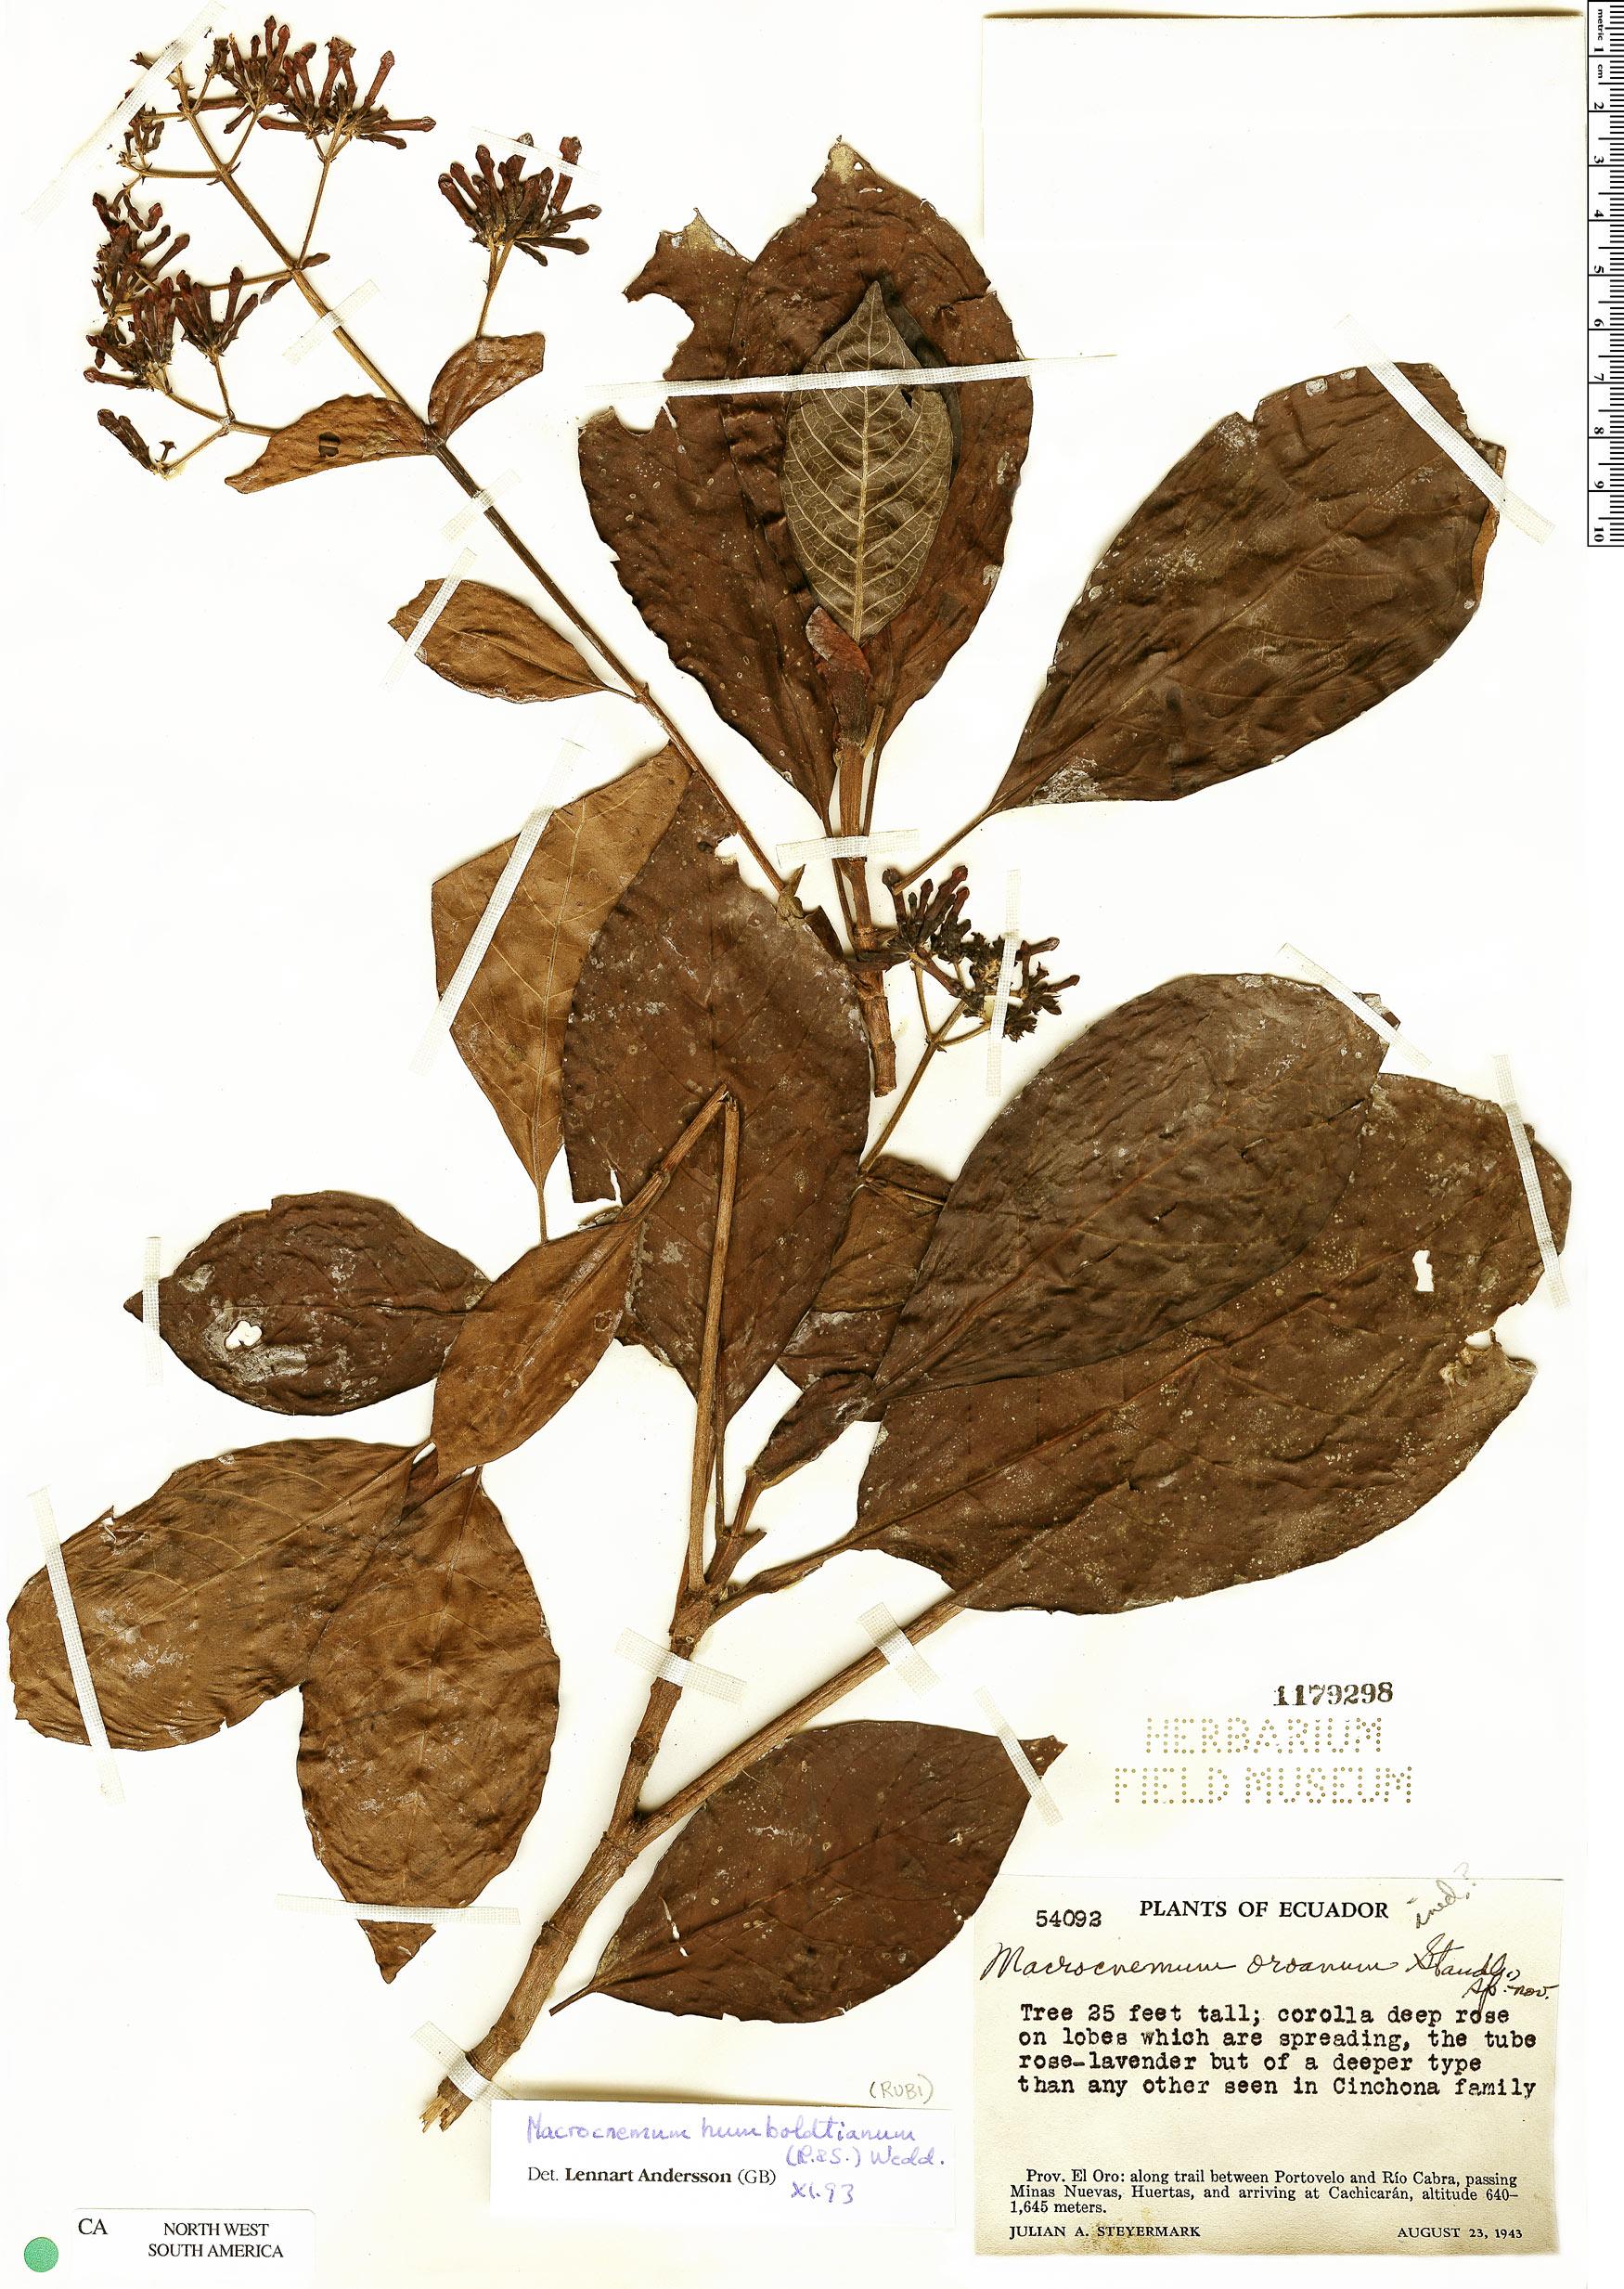 Espécime: Macrocnemum humboldtianum